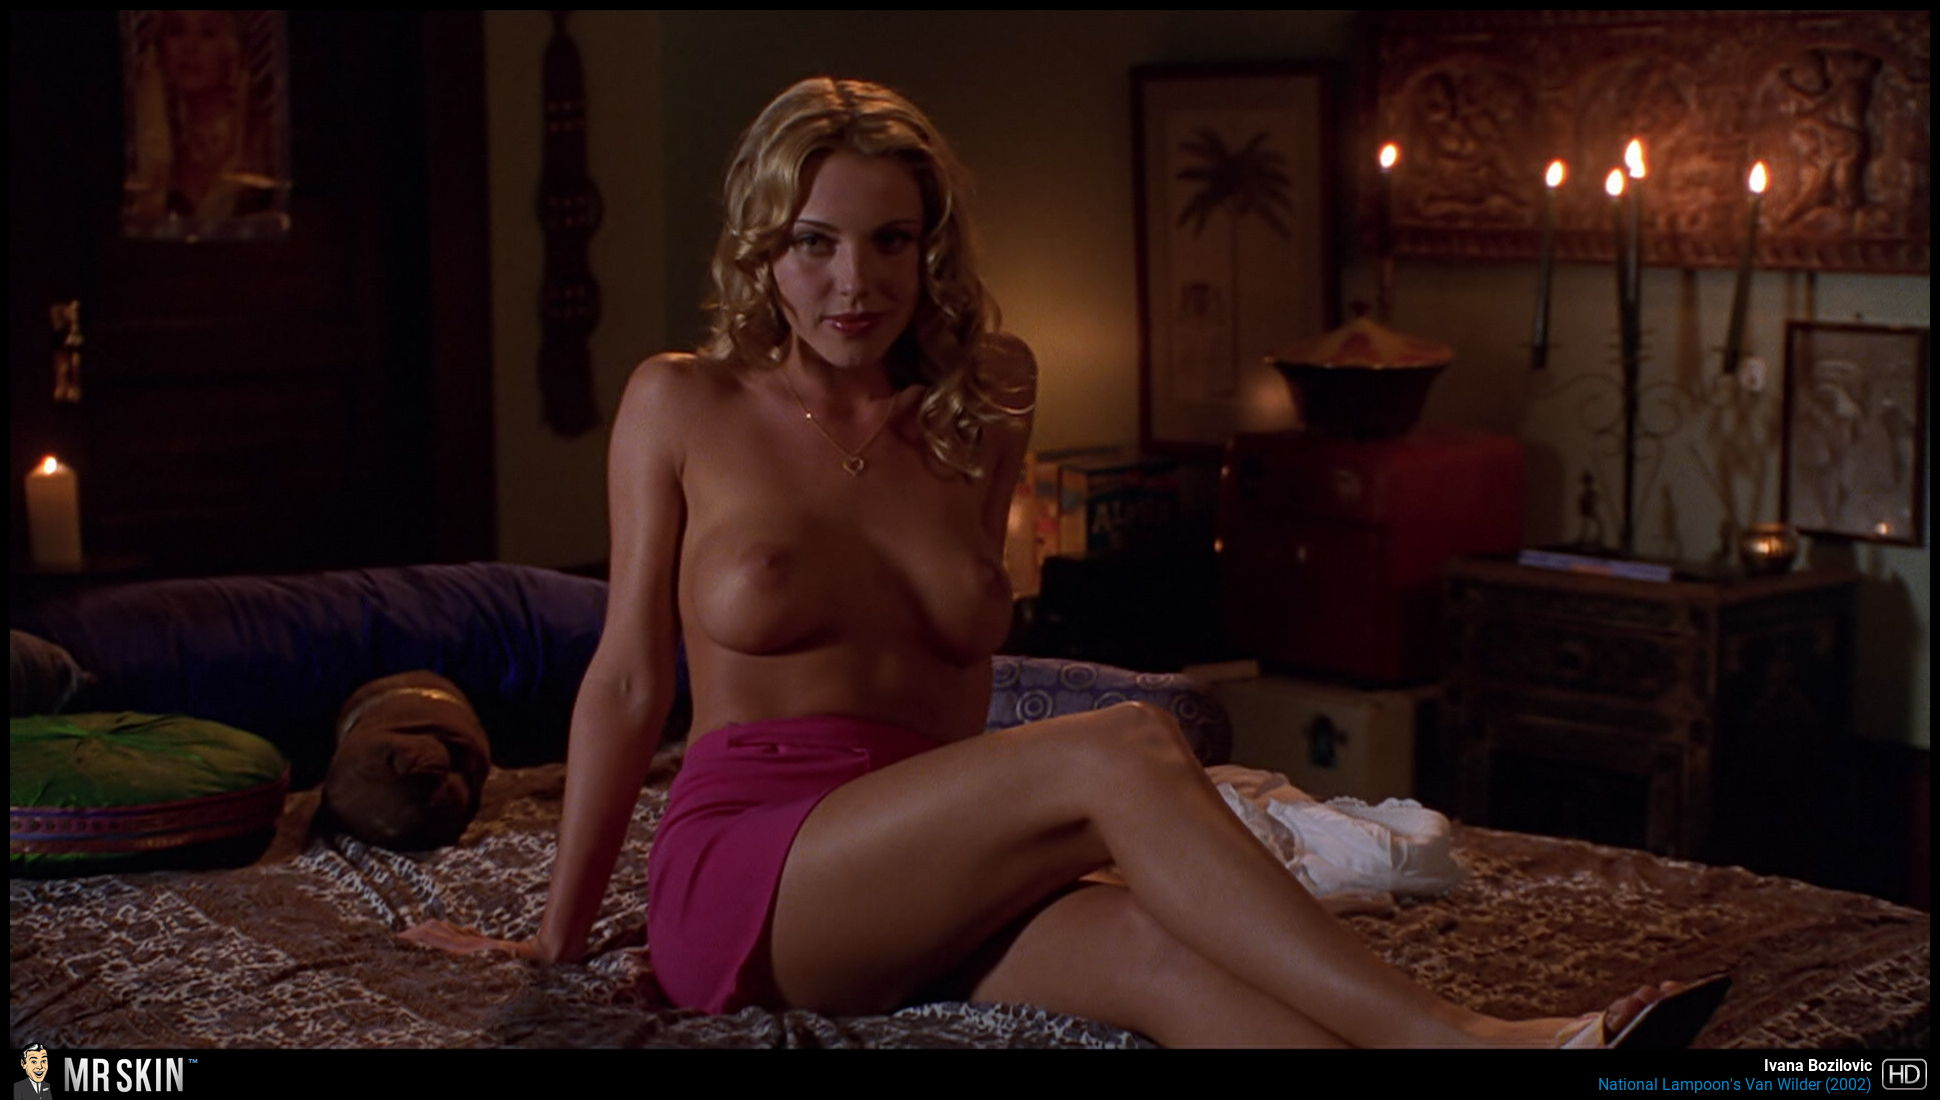 100 Photos of Animal House Nude Scenes Porn